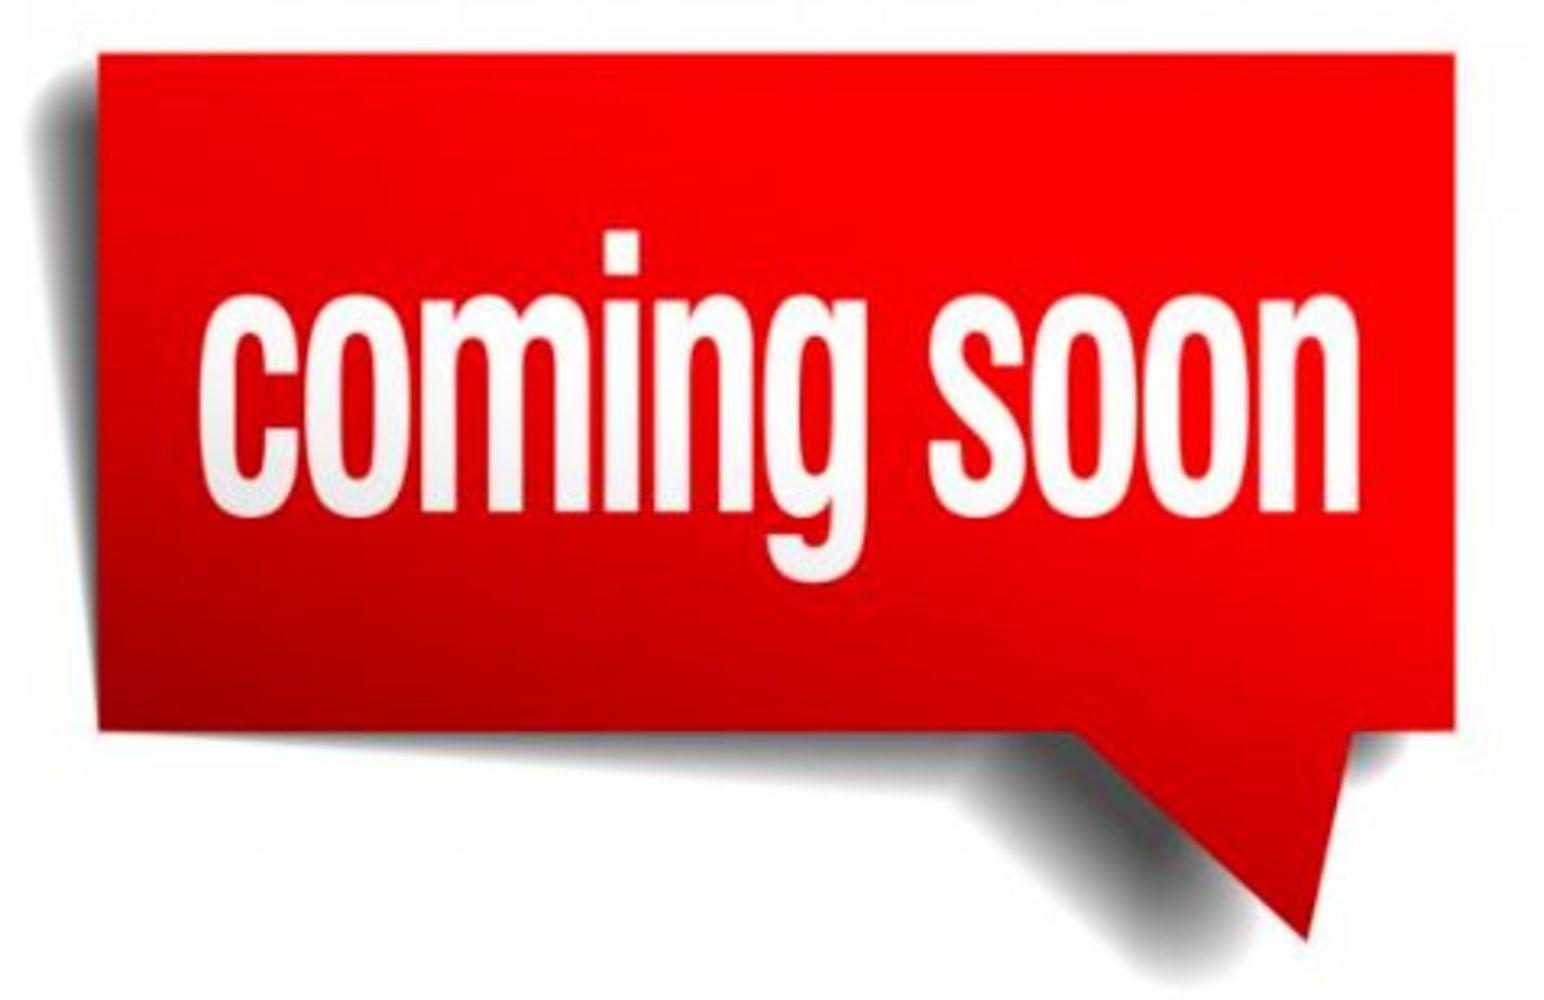 Grade A Branded Footwear, Adidas, Nike, Lacoste, Under Armour, New Balance, Reebok, Puma, Kickers, Ralph Lauren, Skechers, Tommy Hilfiger, Gola, Rockport, K-Swiss, Ellesse, Penguin, Jack & Jones, Vans,